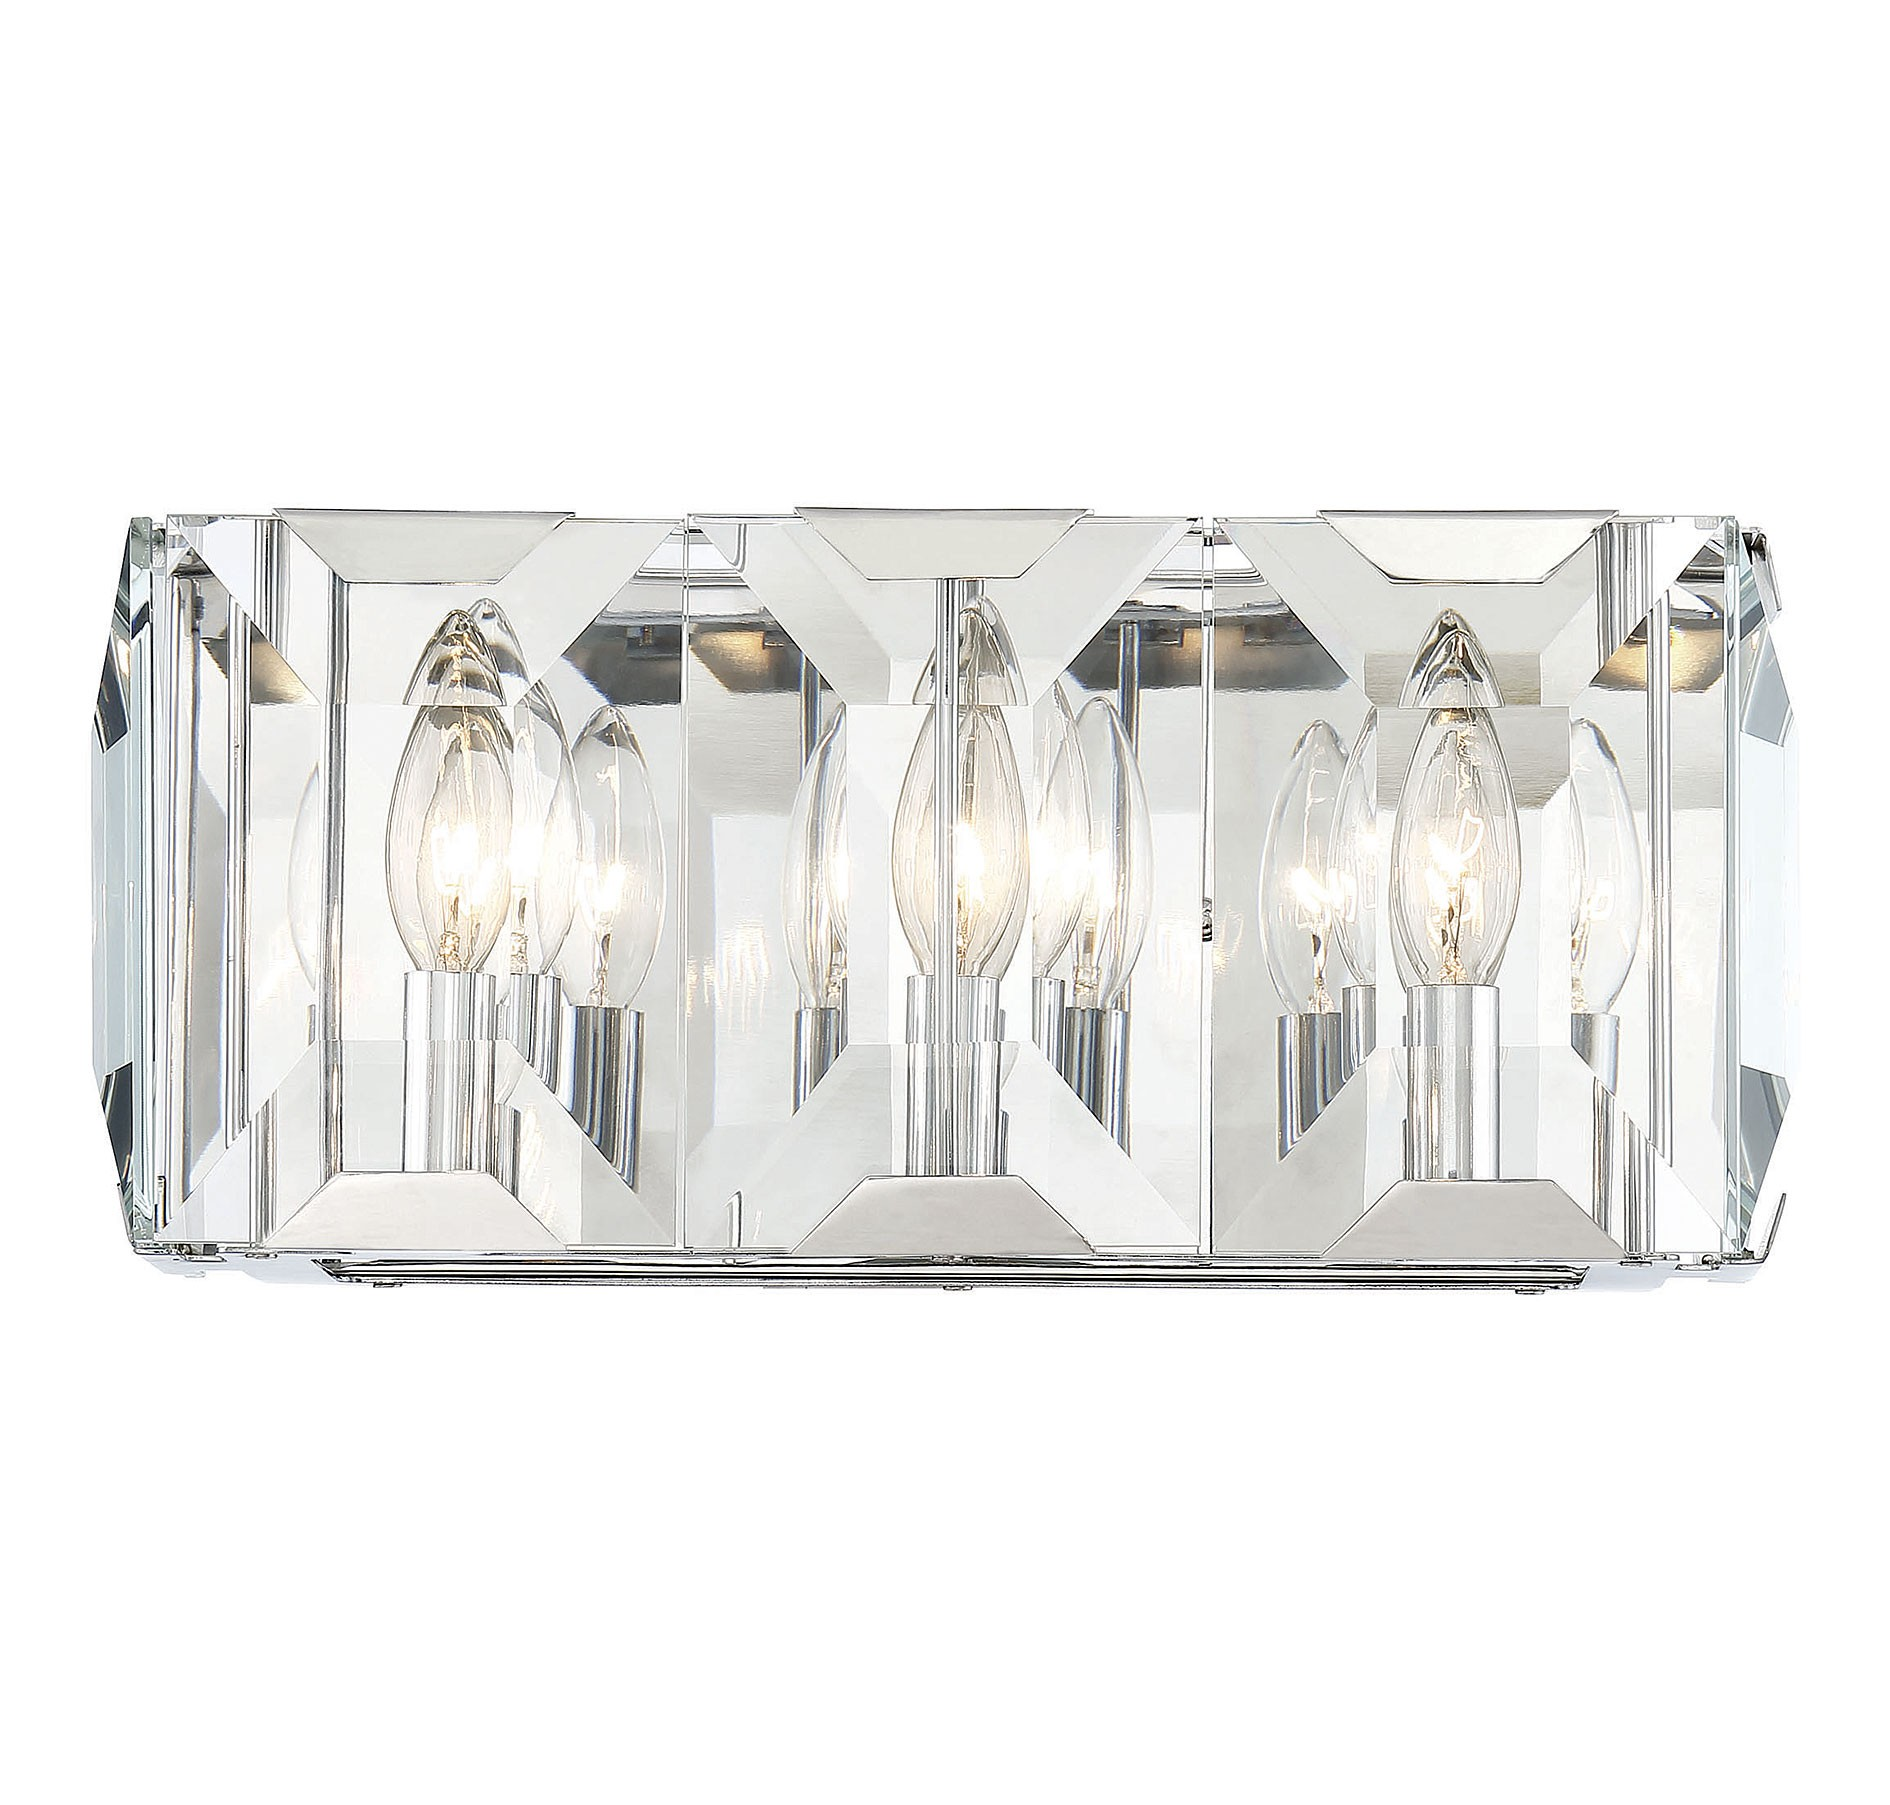 Bangle Bathroom Vanity Light by Savoy House | 8-4705-3-11